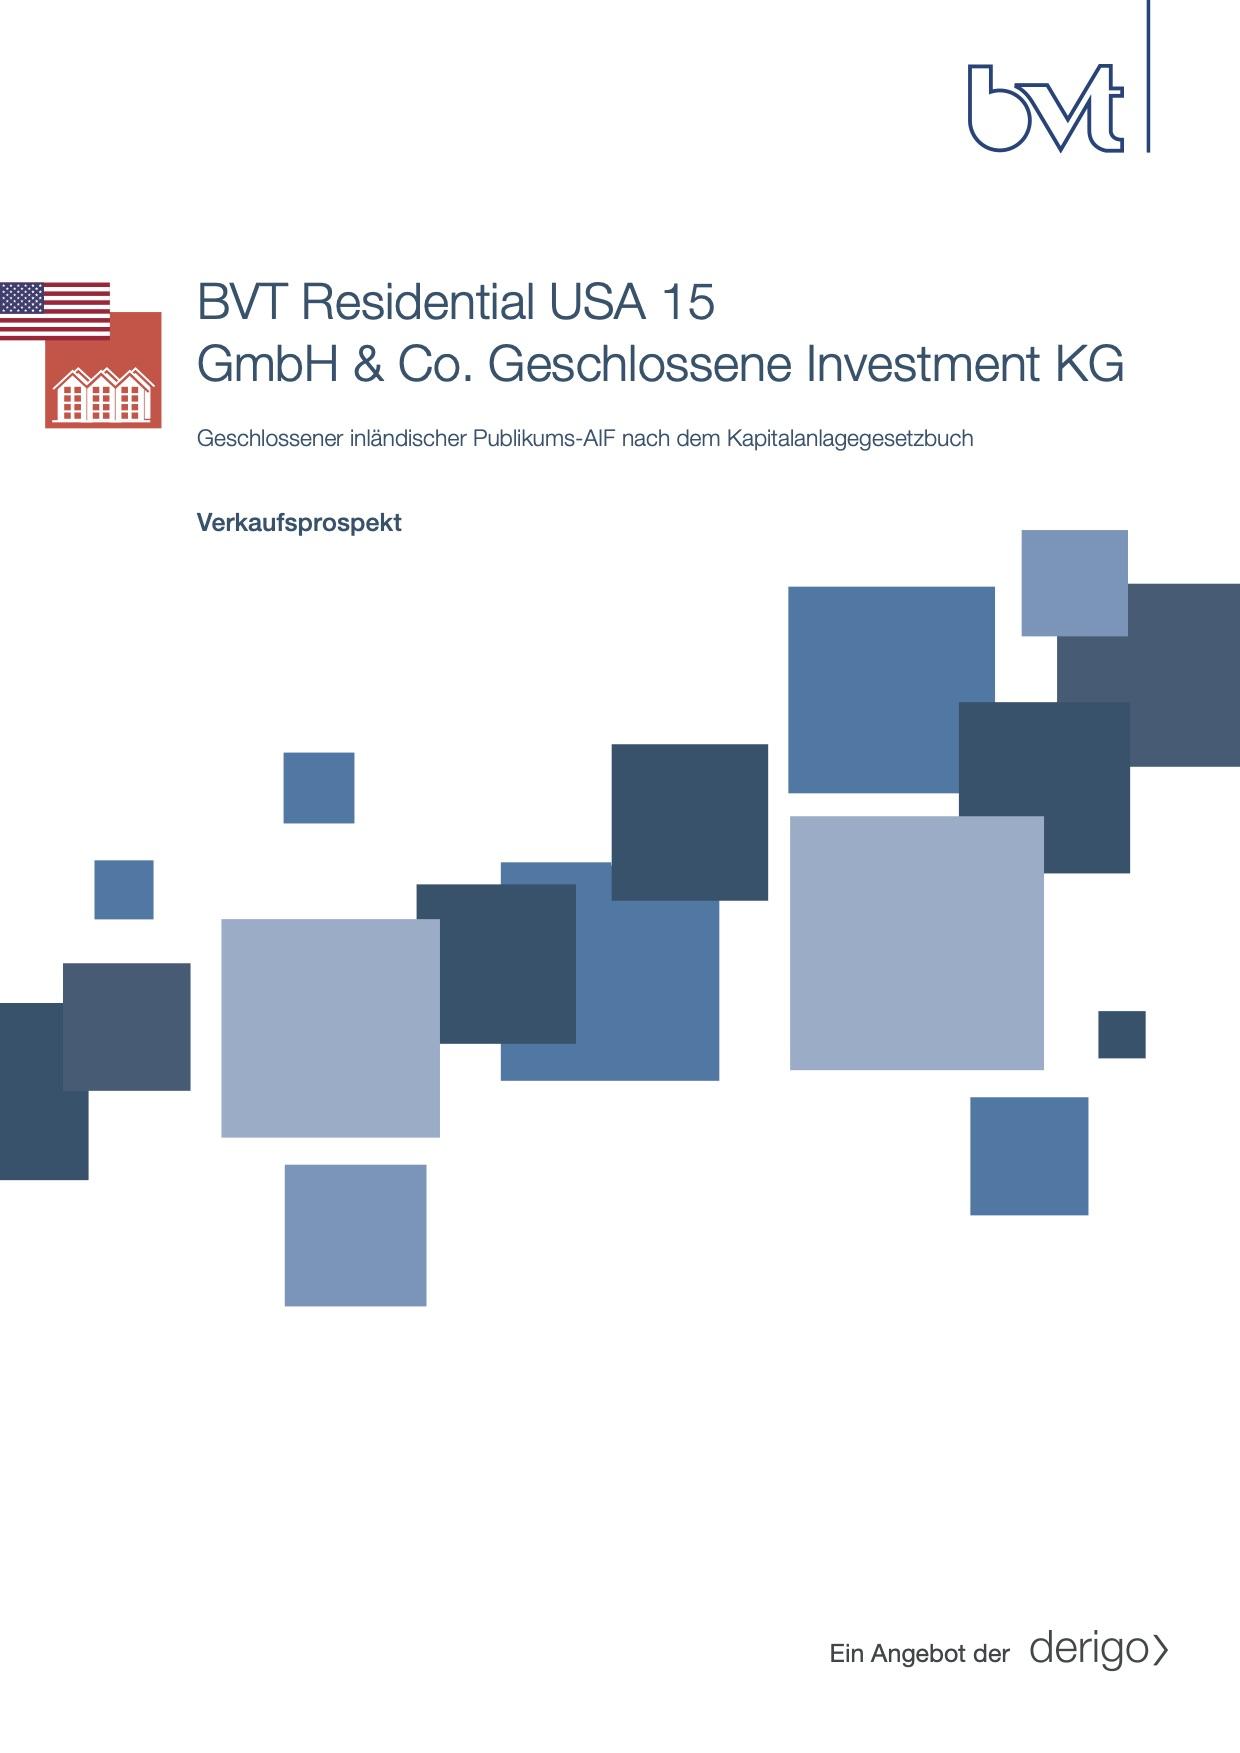 BVT Residential USA 15